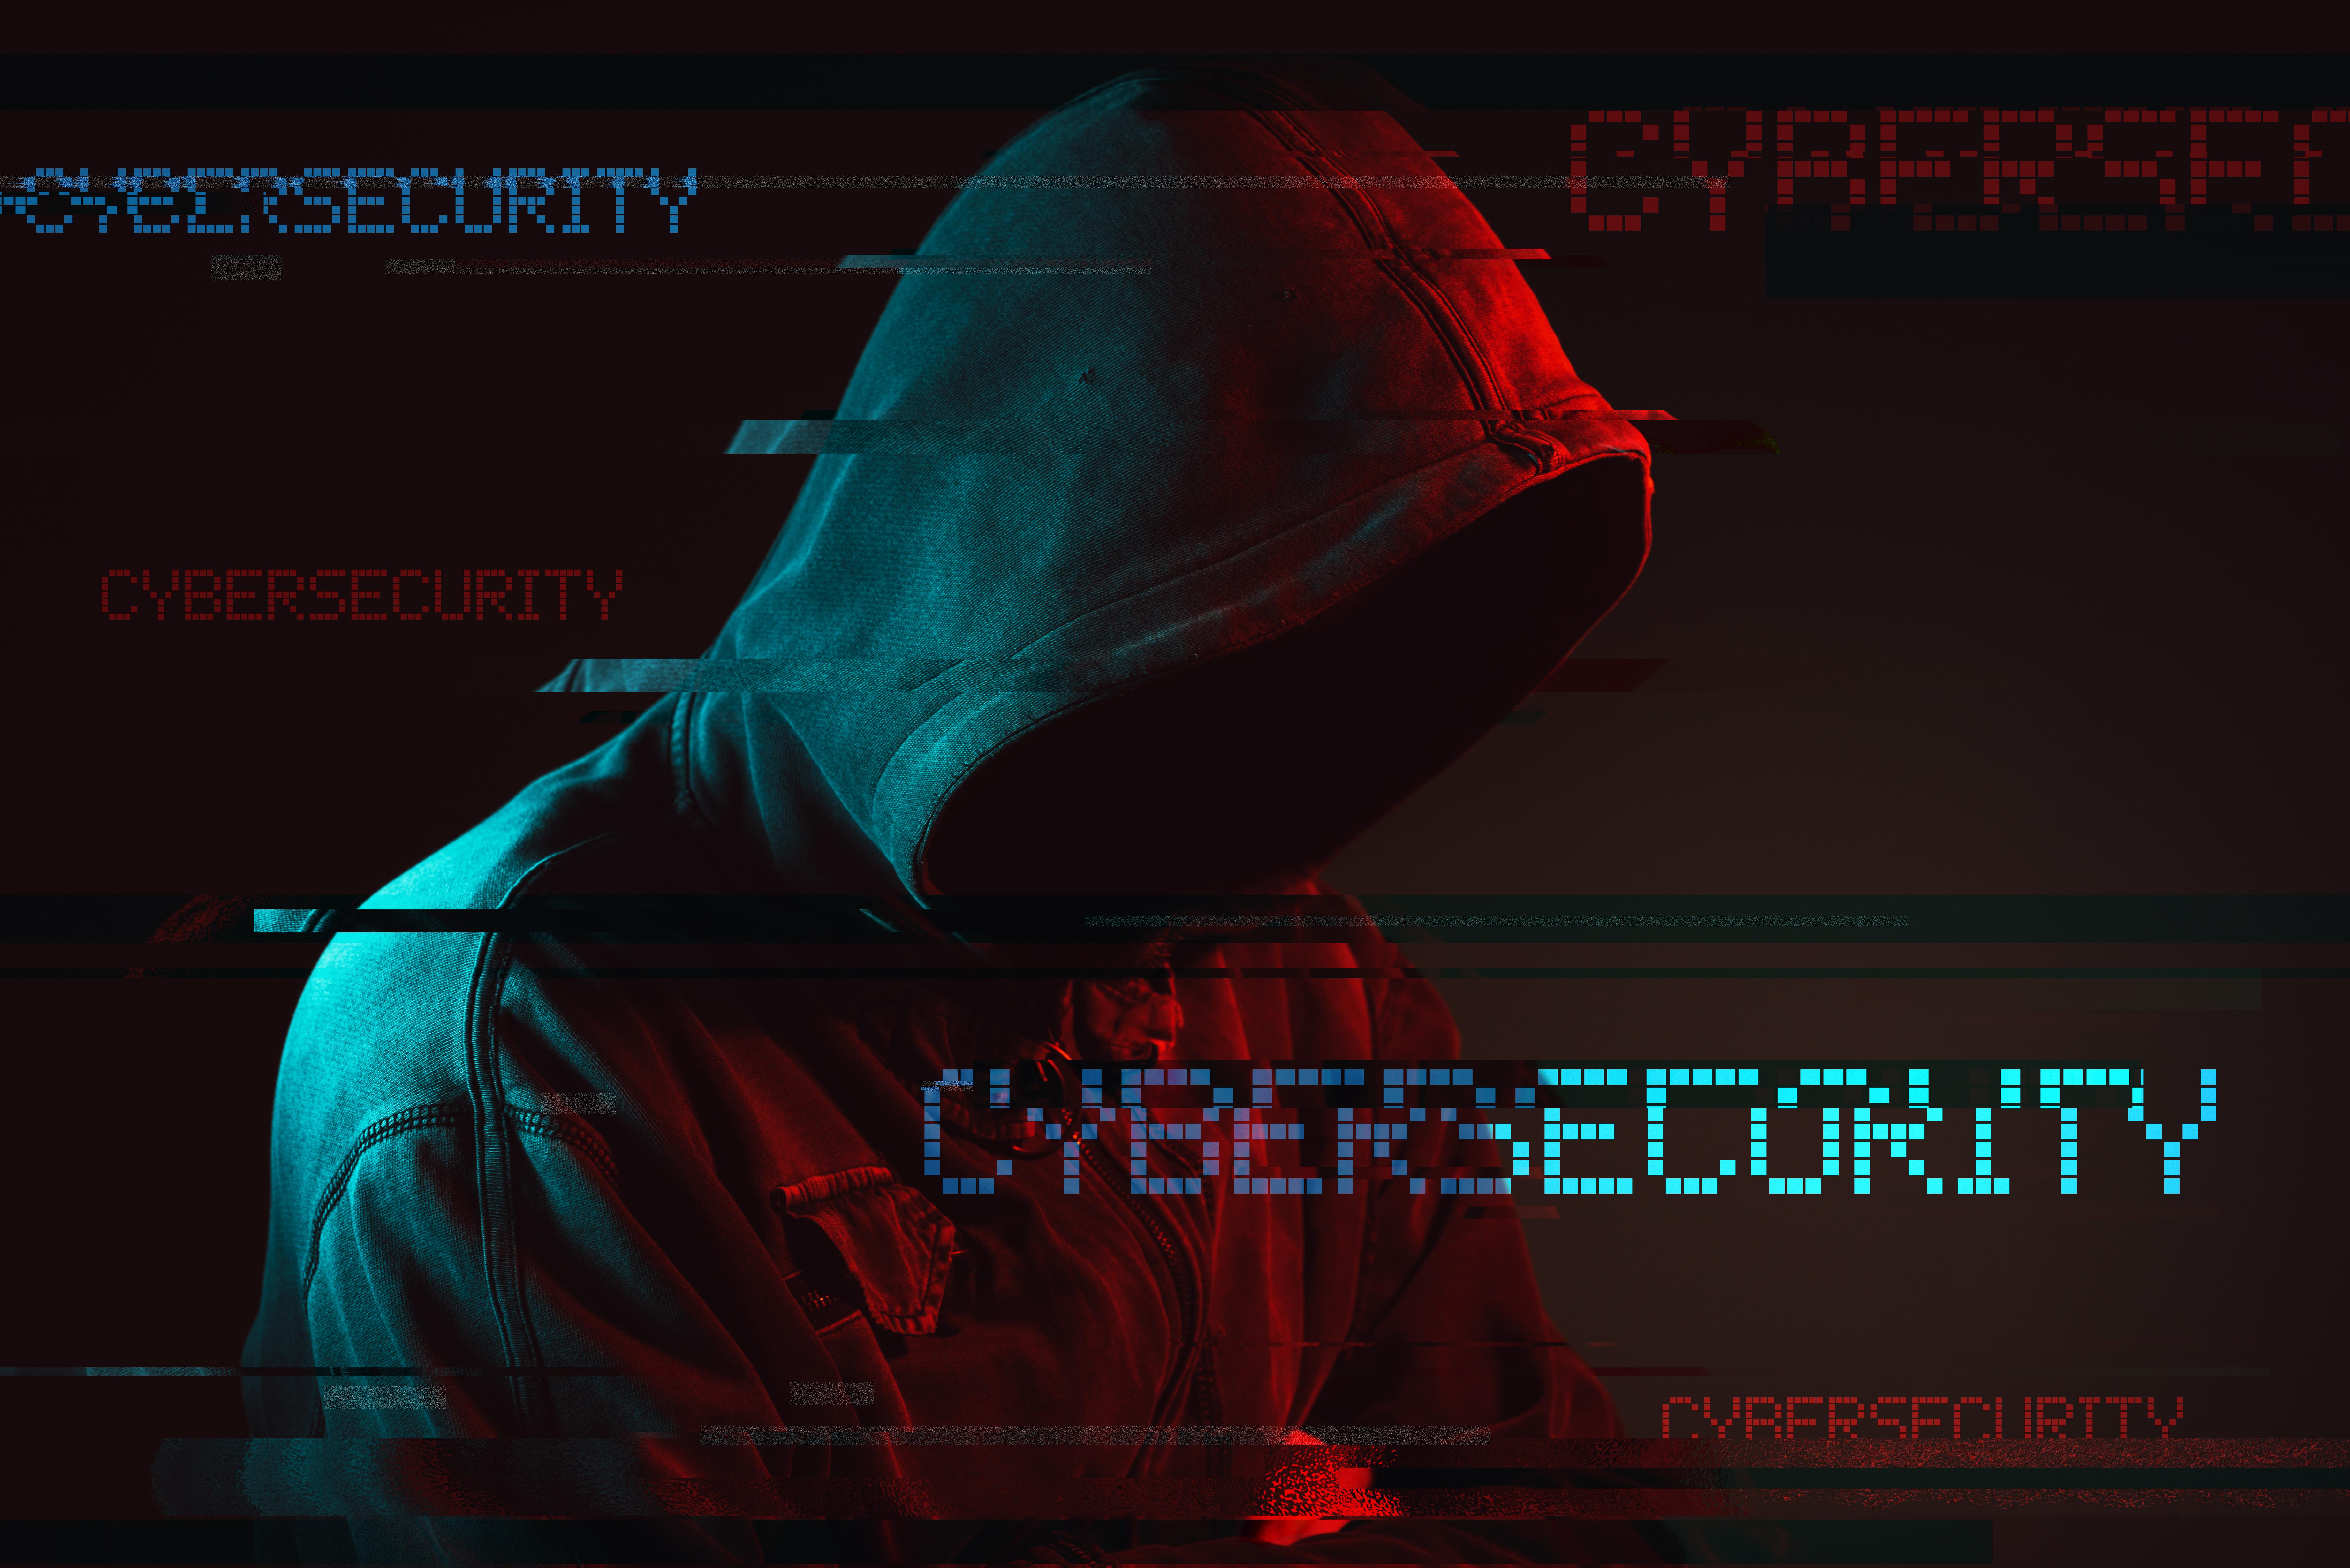 Cybersecurity Failure